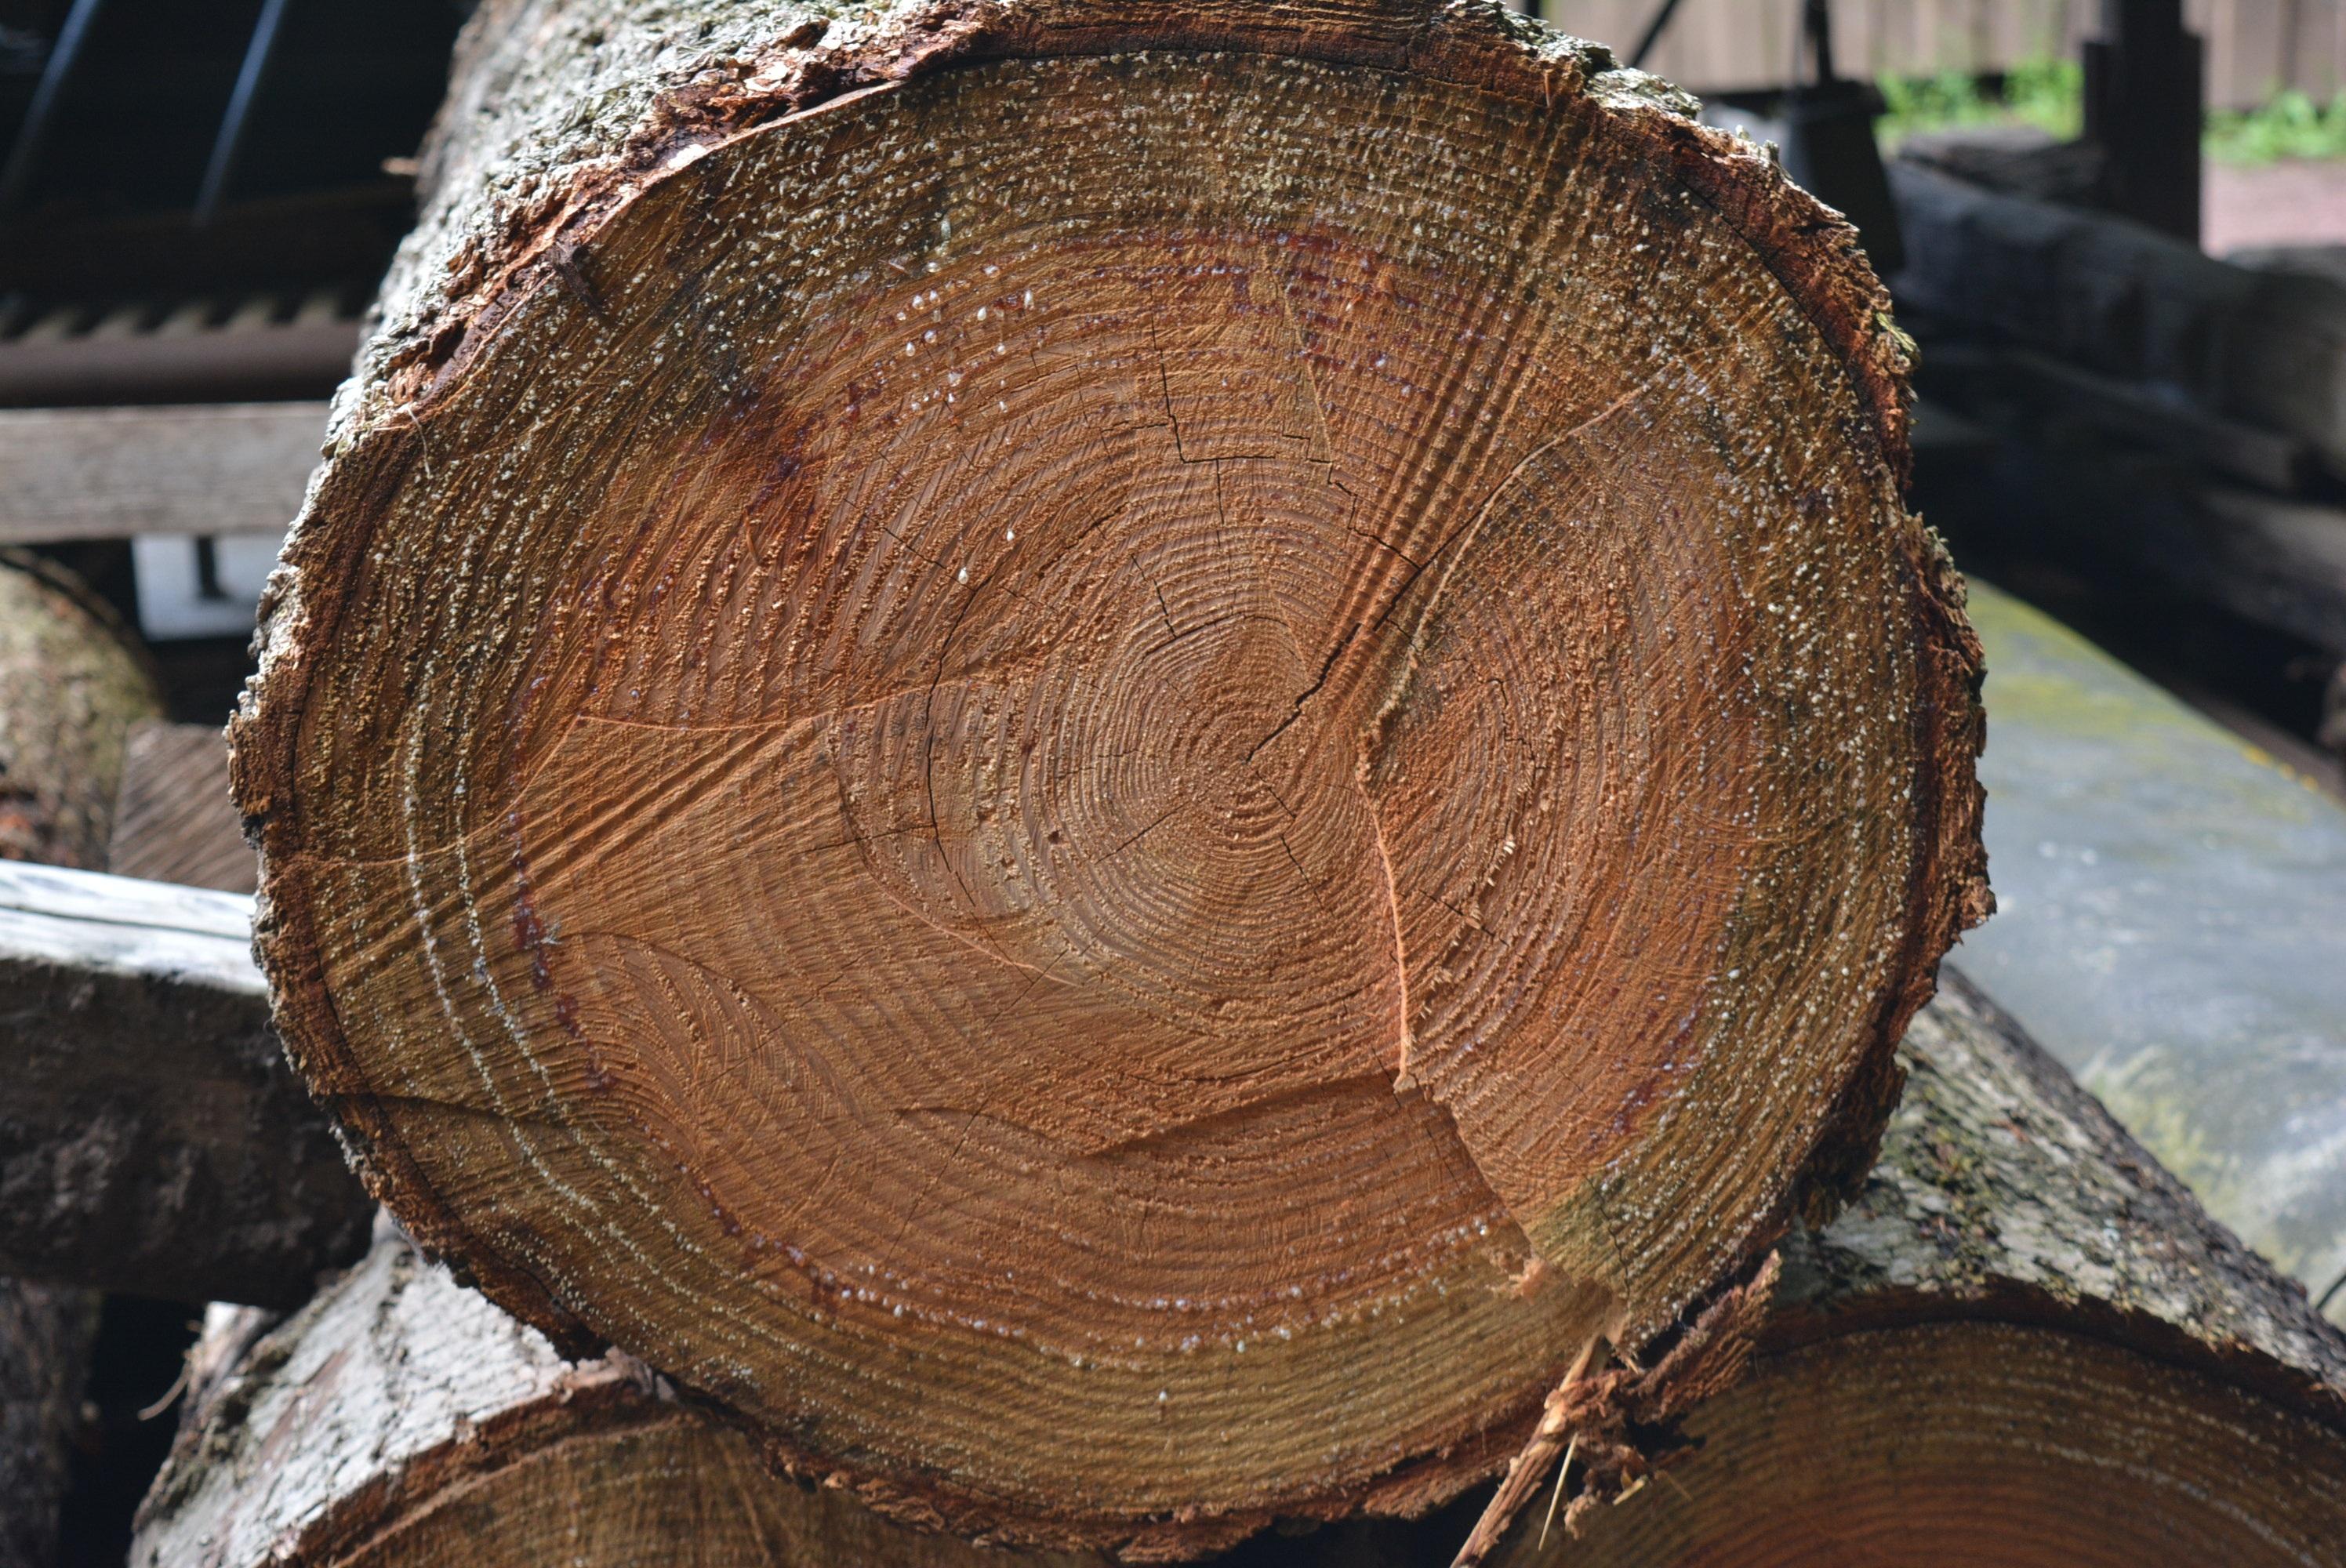 картинки с вырезом на дерево также при осаде